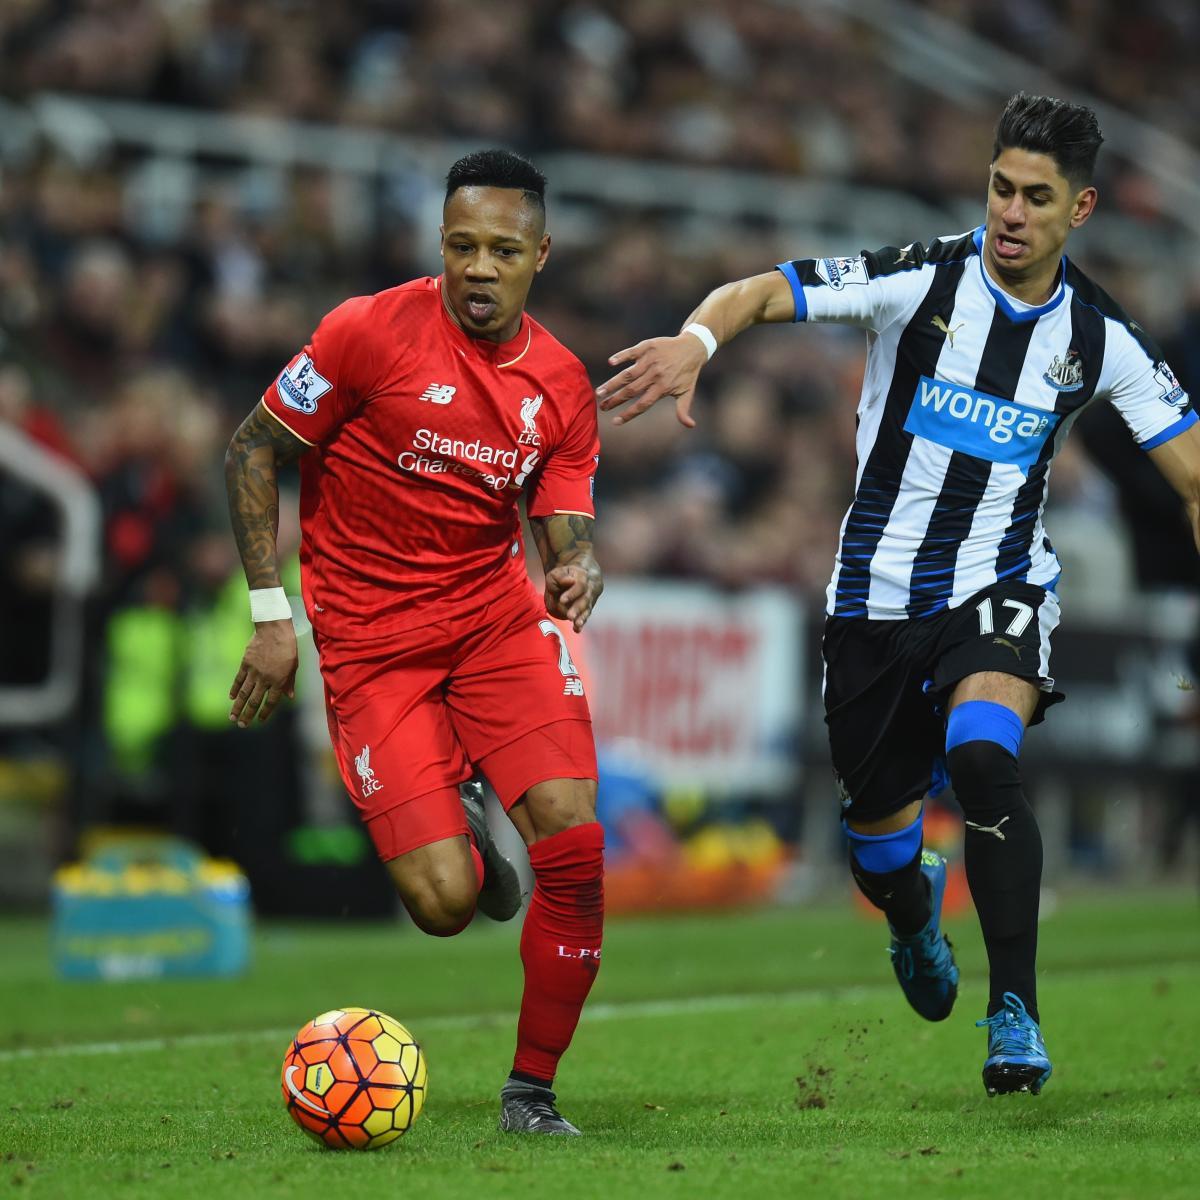 Live Streaming Soccer News Liverpool Vs Benfica Live: Liverpool Vs. Newcastle: Team News, Live Stream, TV Info